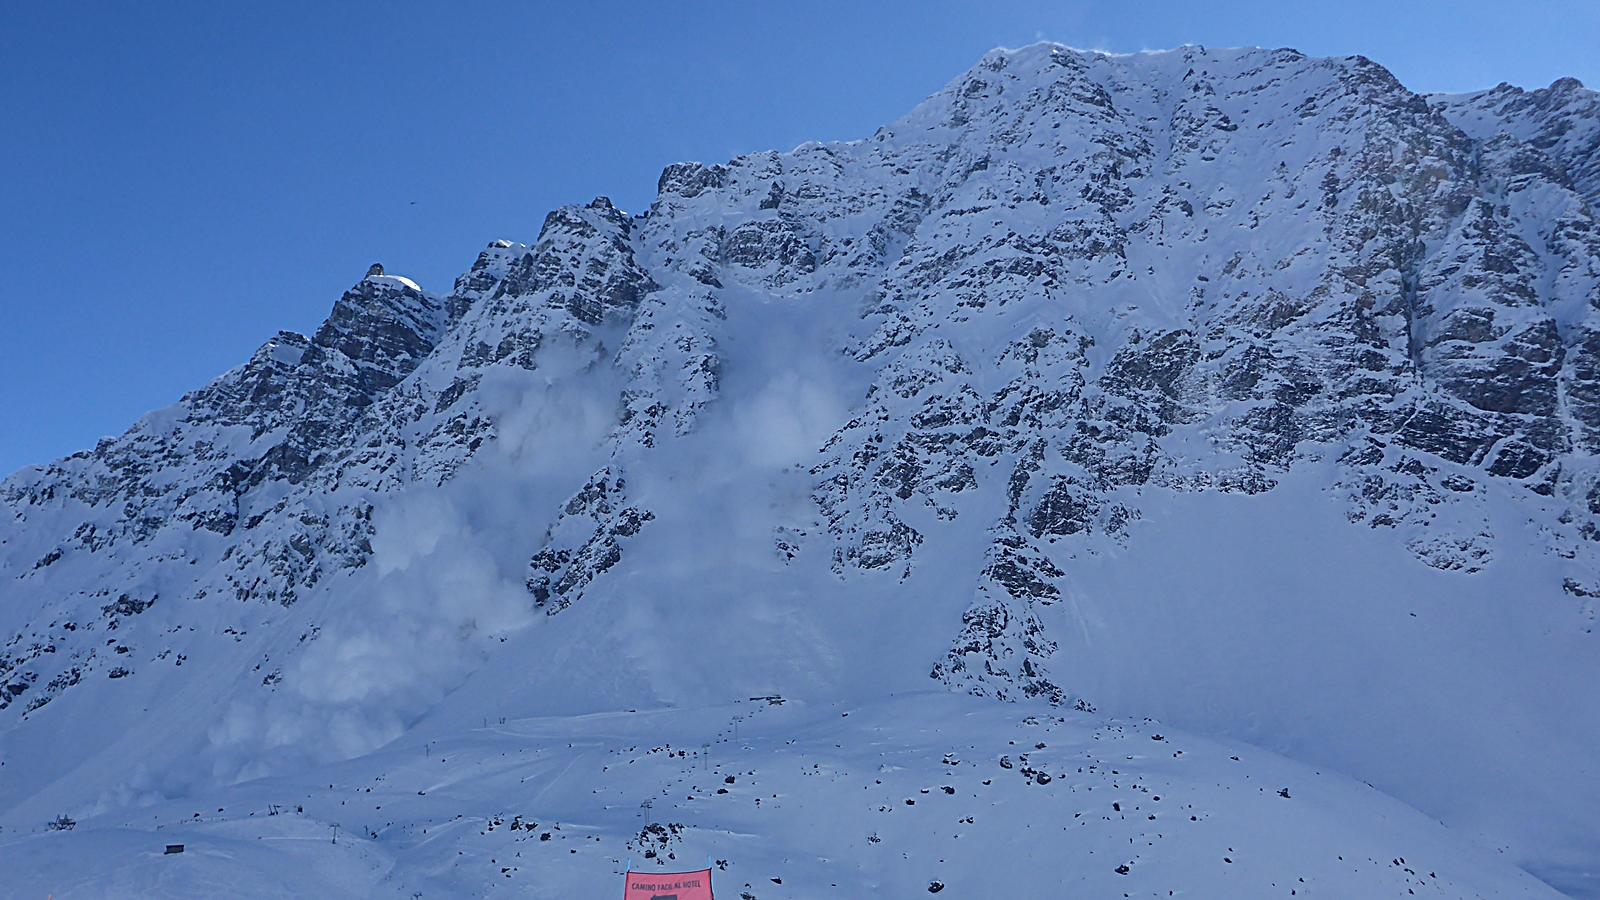 Avalanche | Warning | Risk